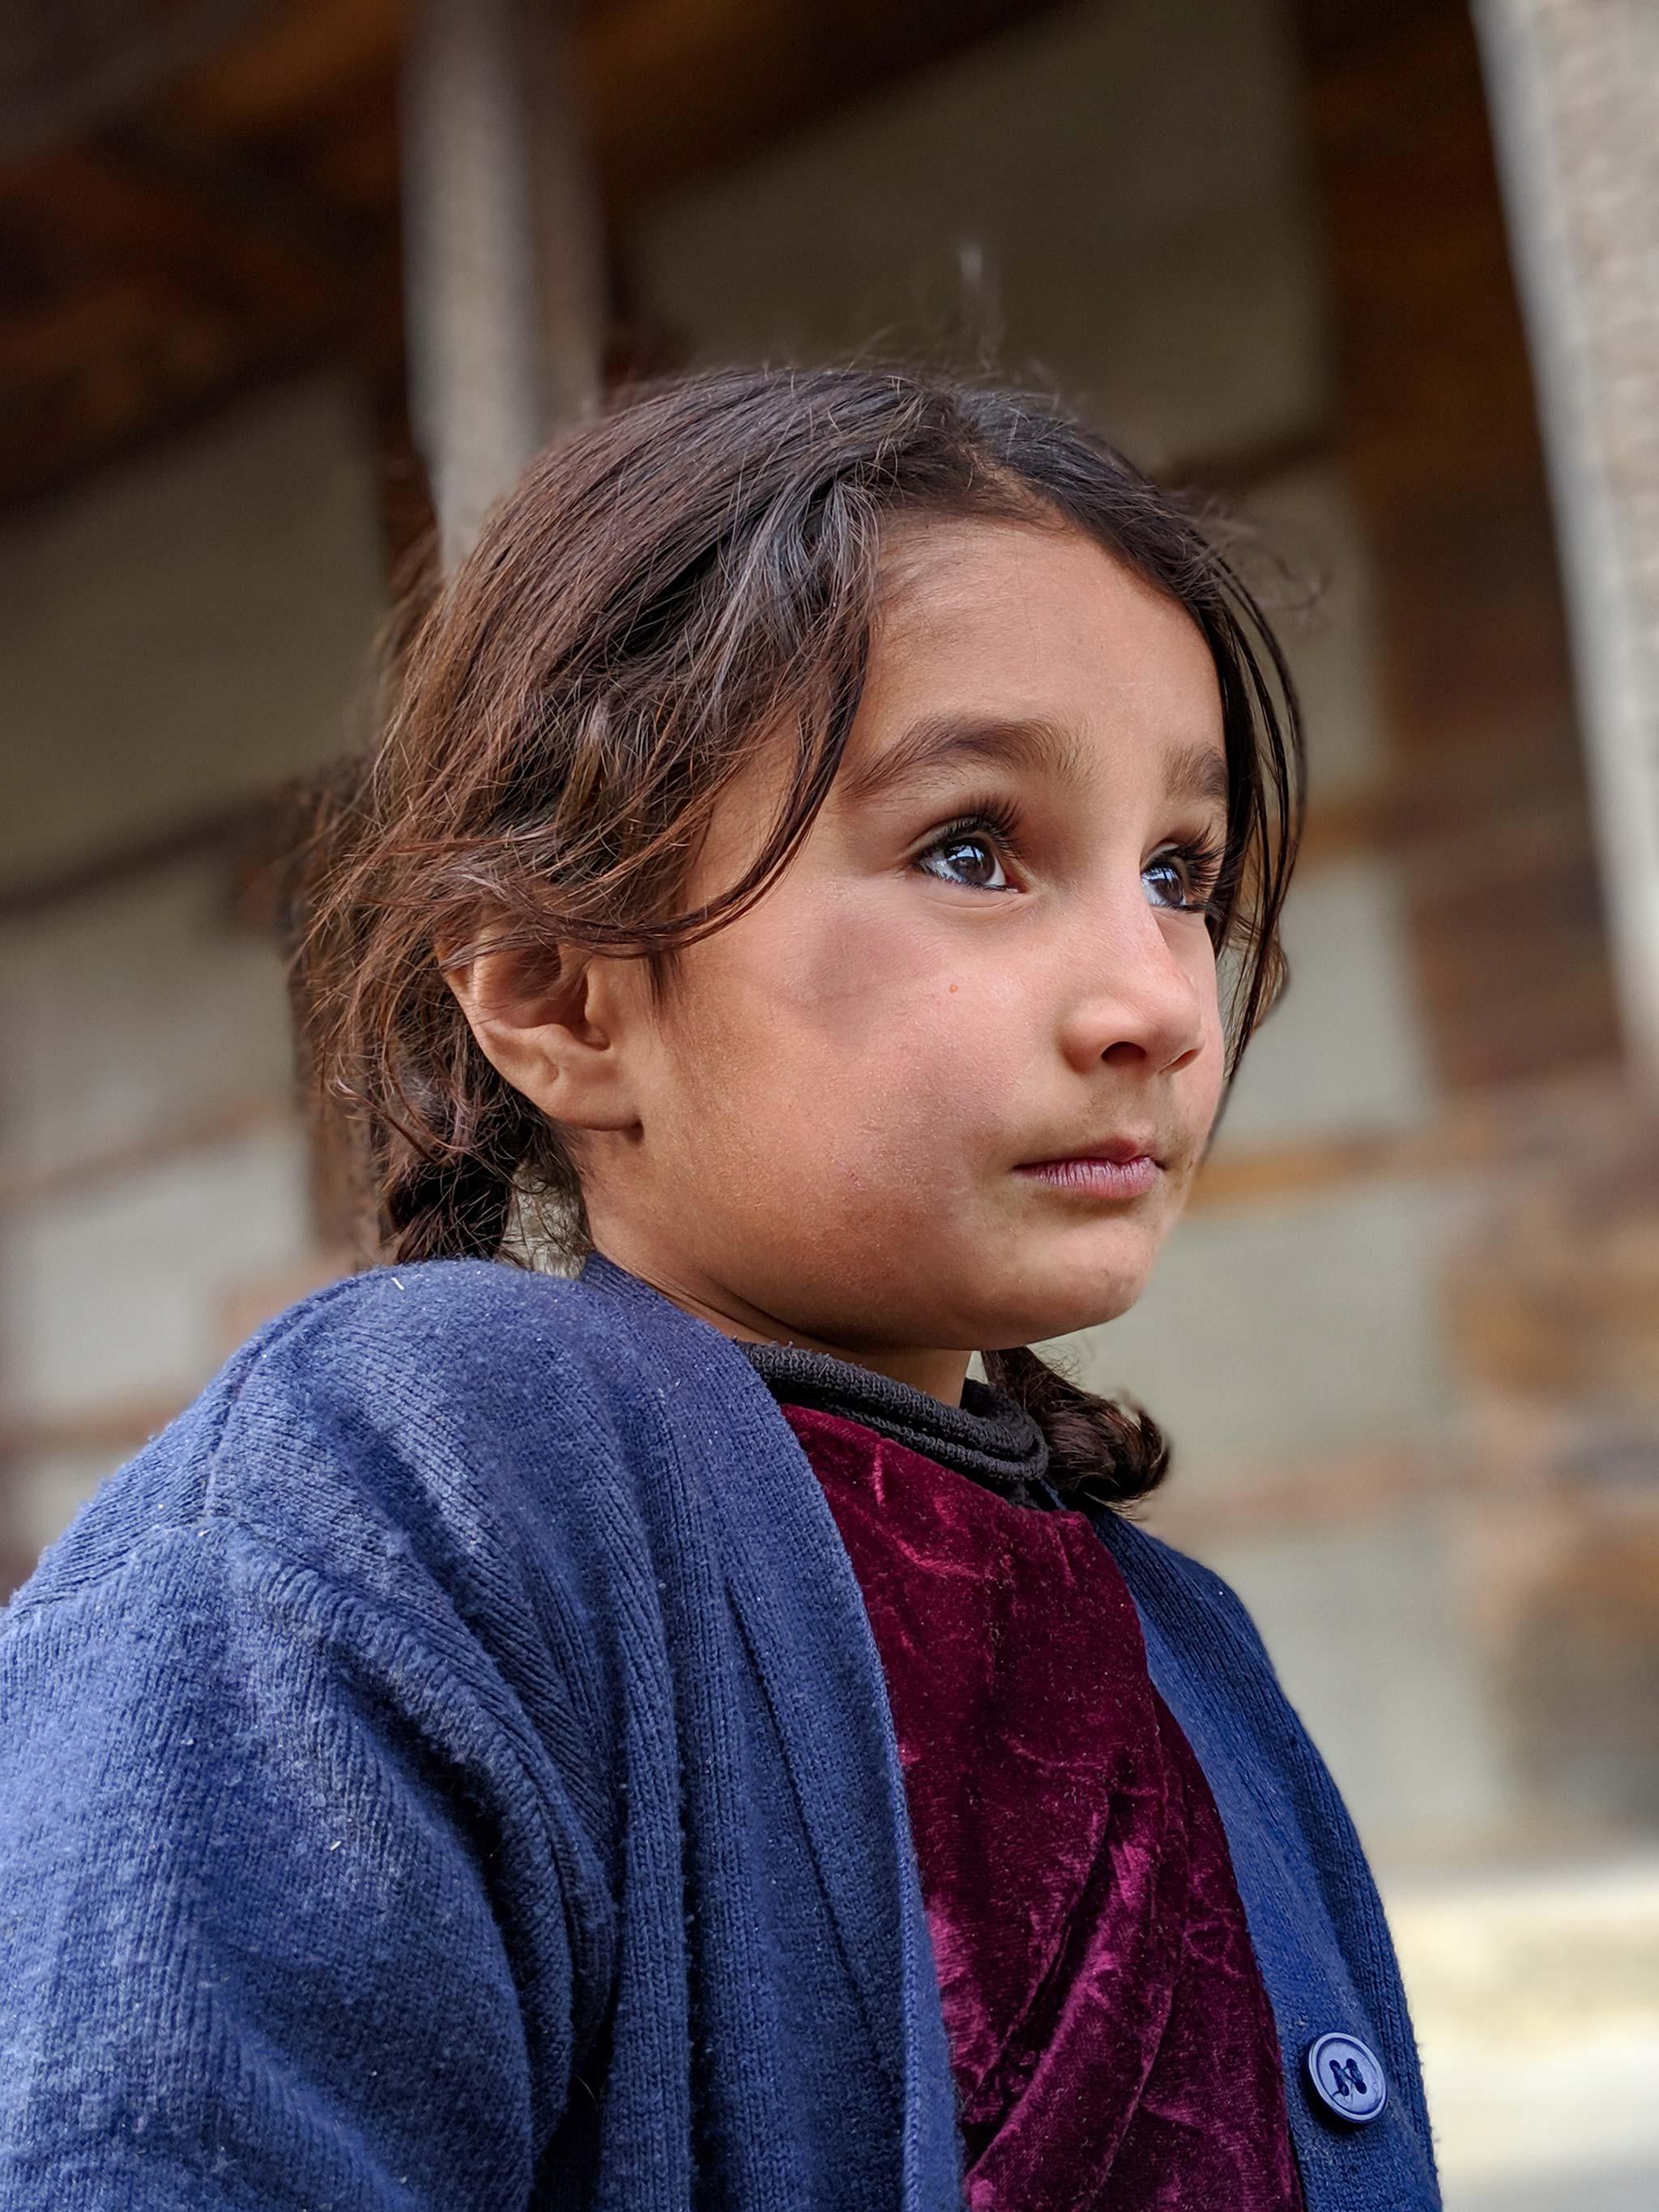 Pakistan's-Eyes-25.jpg